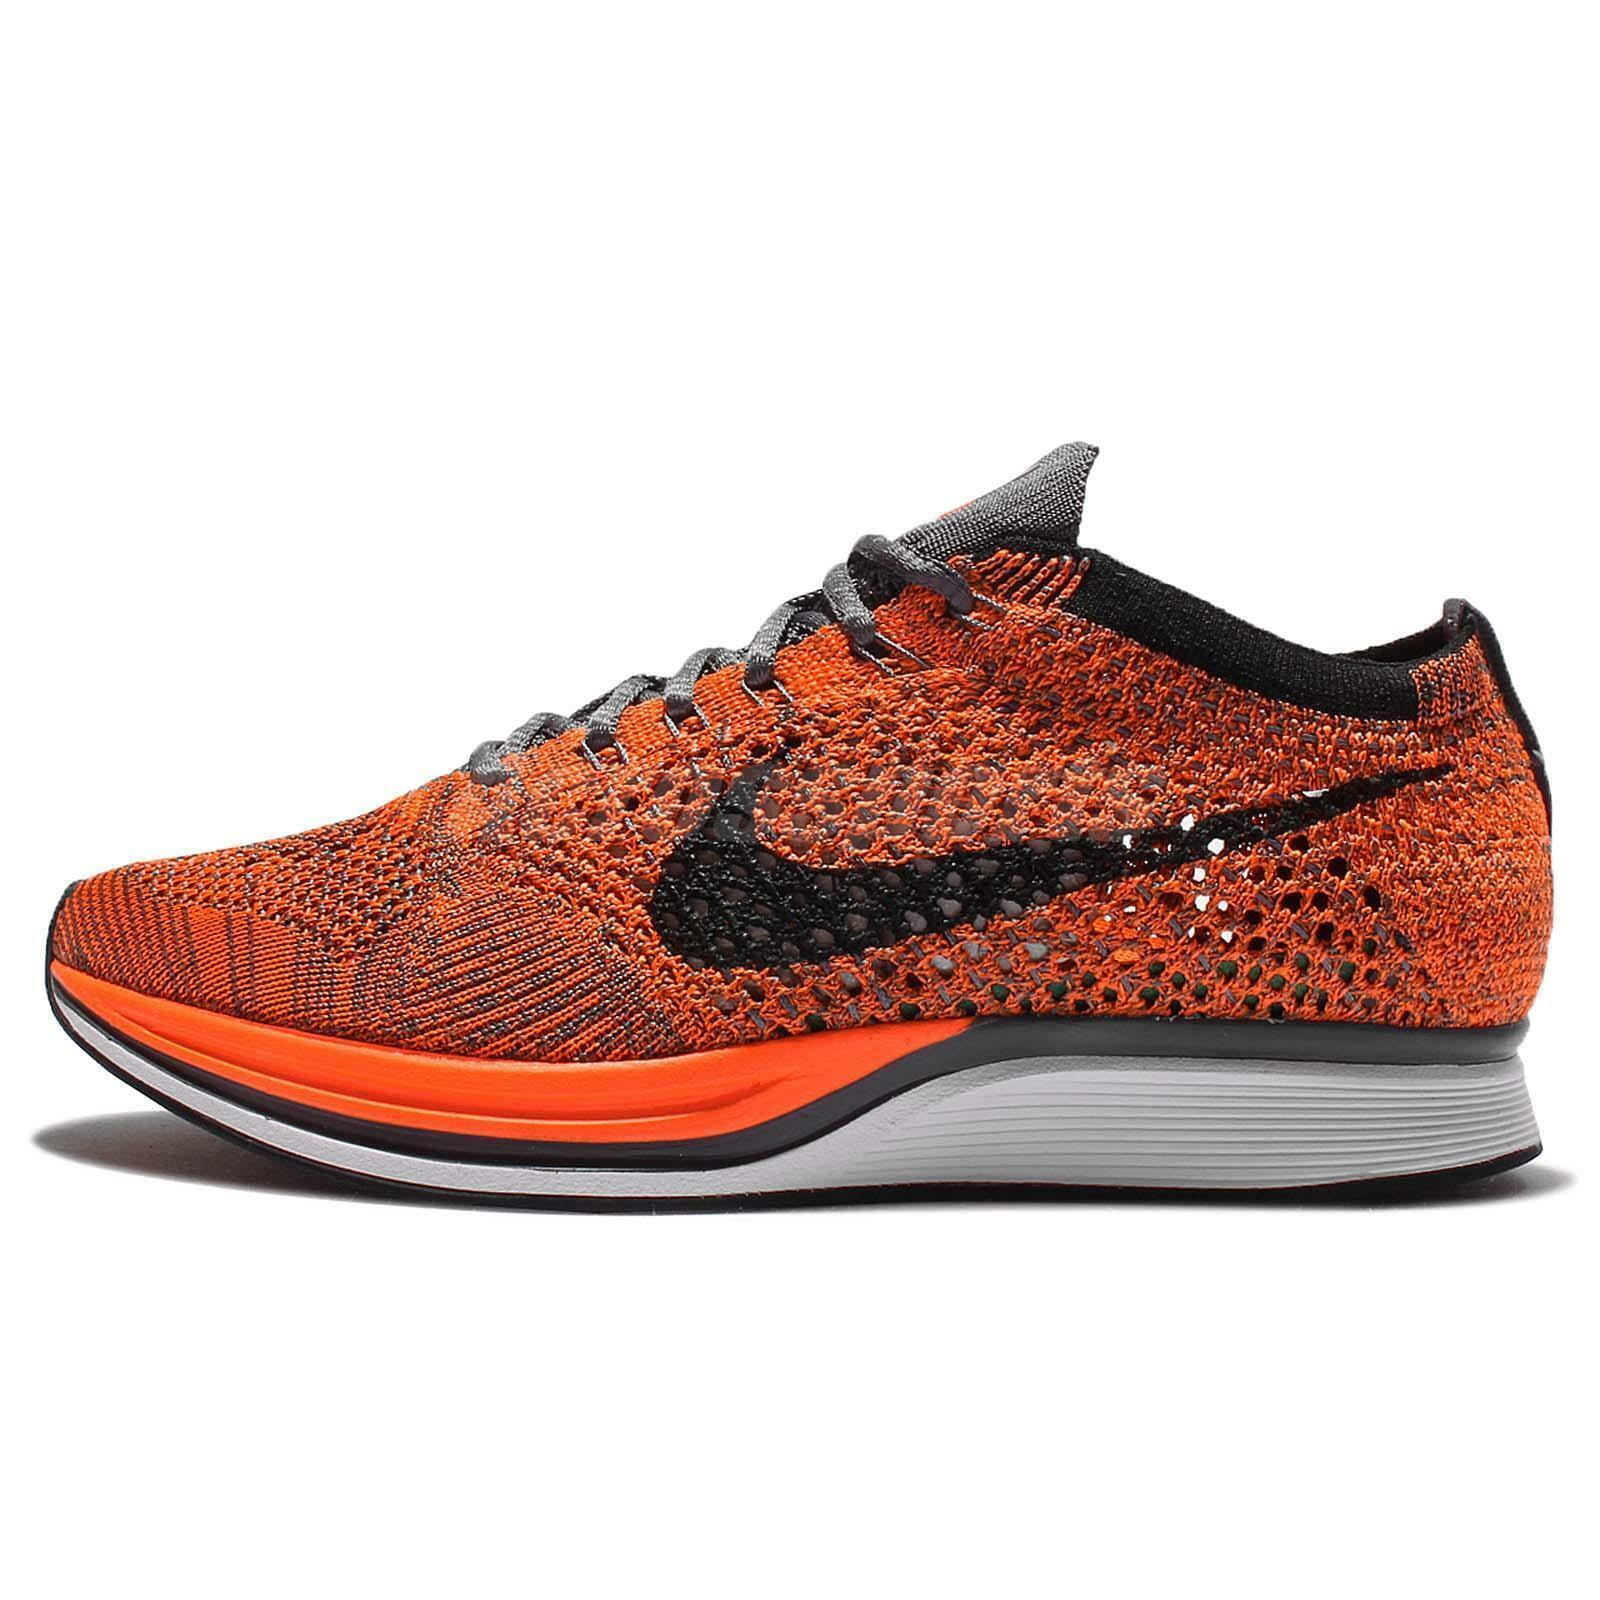 Le scarpe nike flyknit racer arancione bianco grigio 526628 810